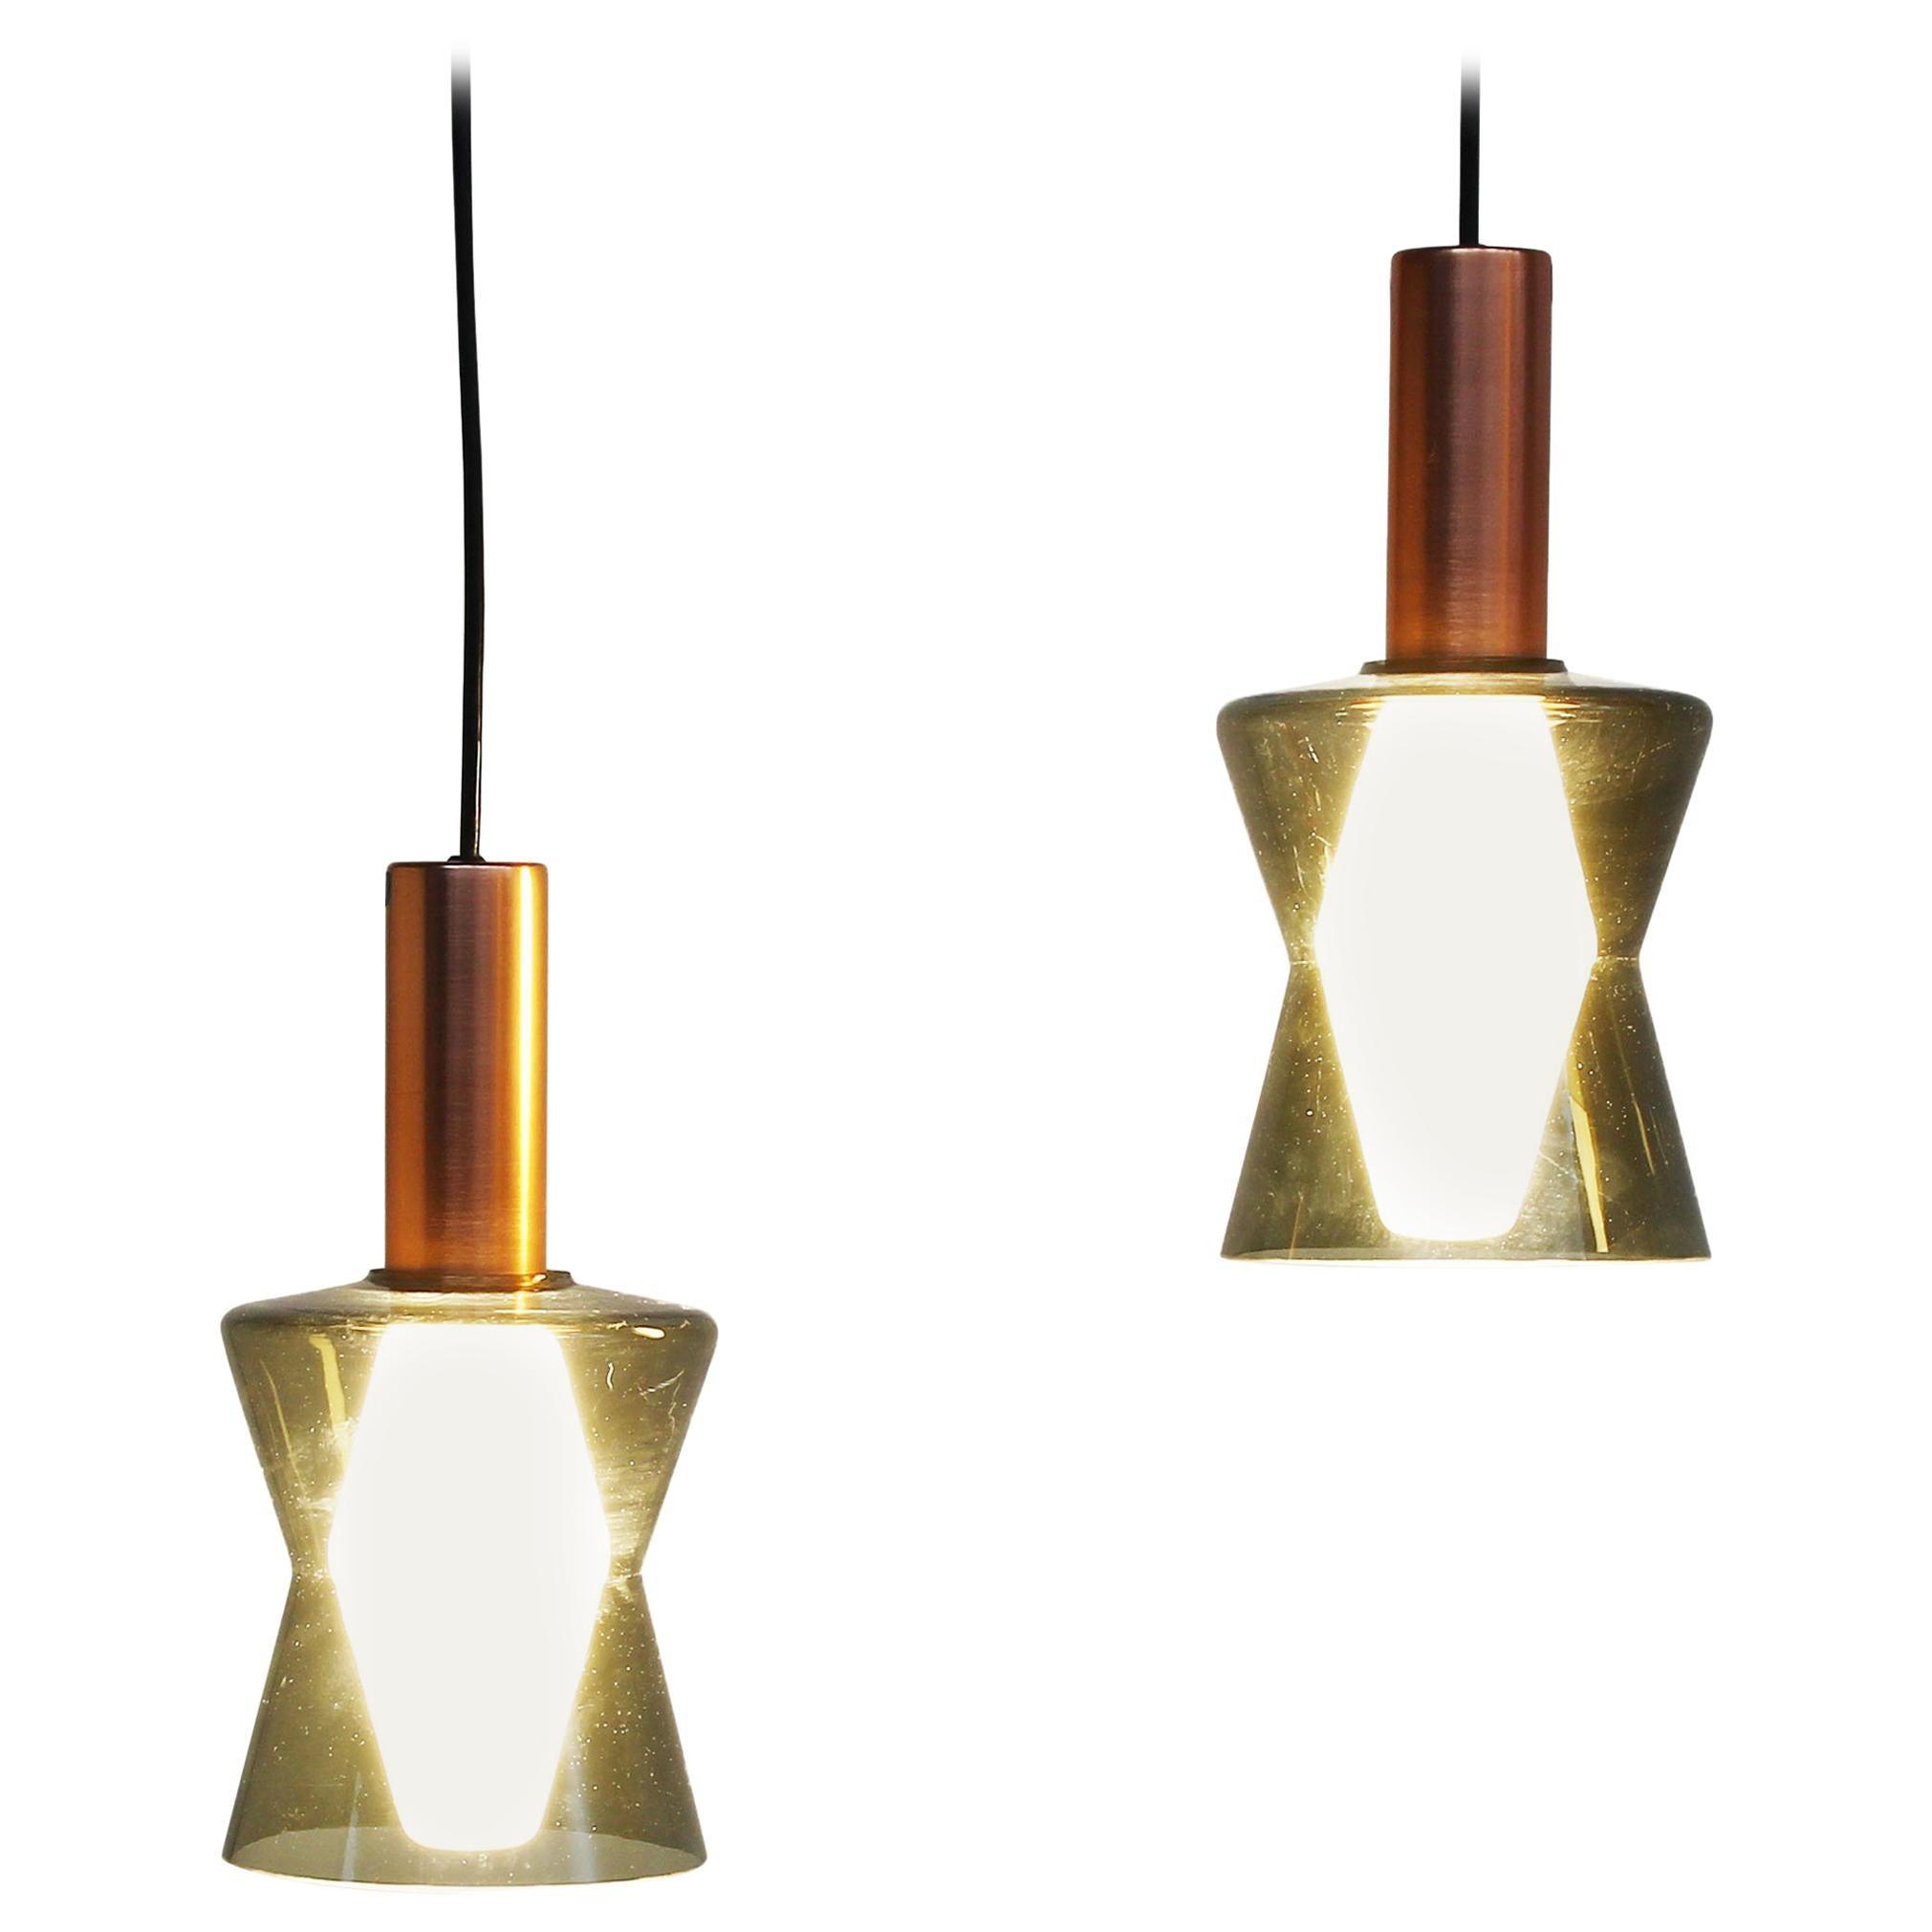 Pair of Original Old Idman Oy Ceiling Lamps Pendants by Tapio Wirkkala